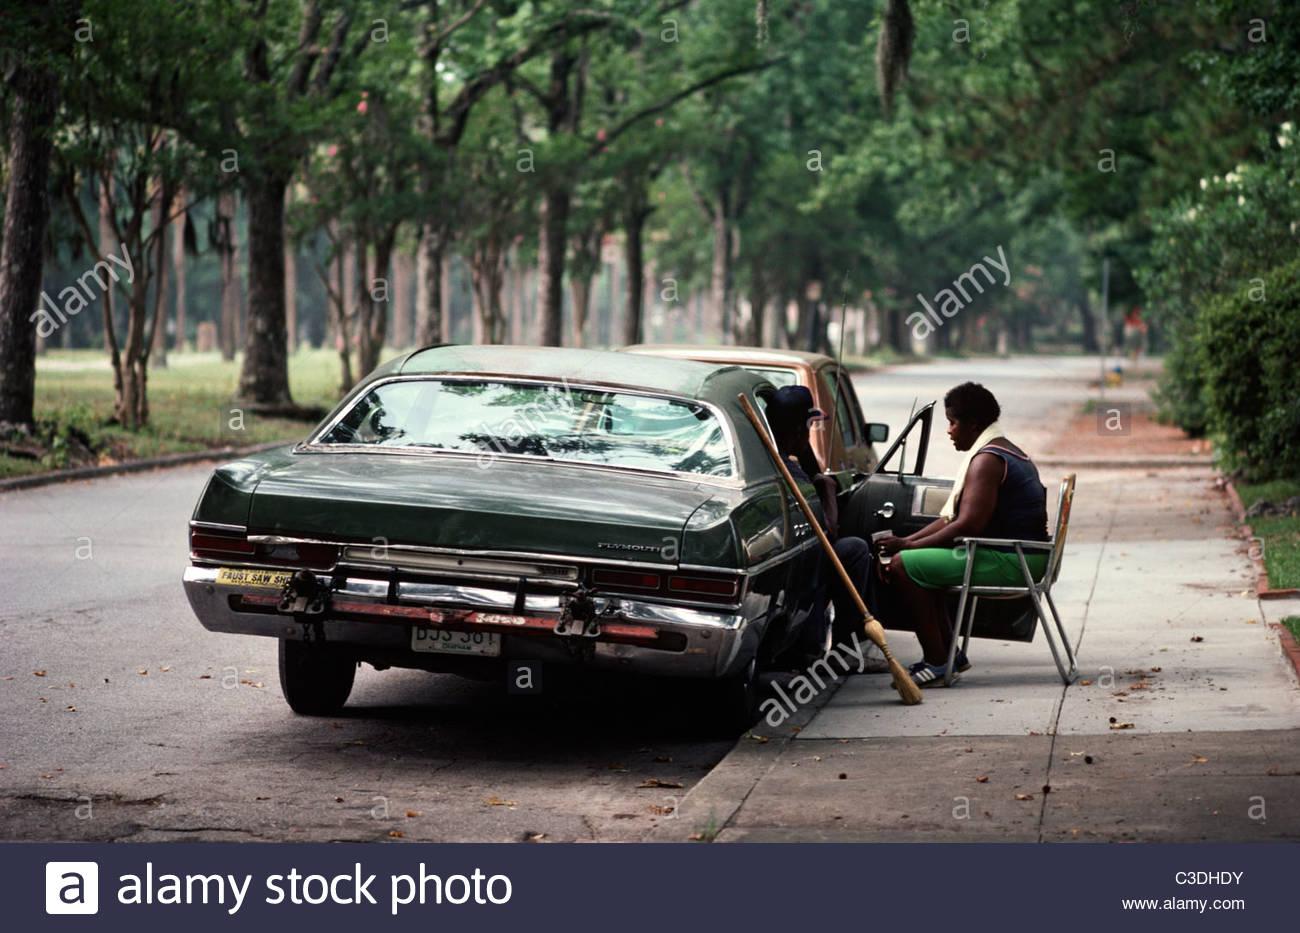 Entspannung im Auto, Savannah, Georgia, USA, 80er Jahre Stockbild